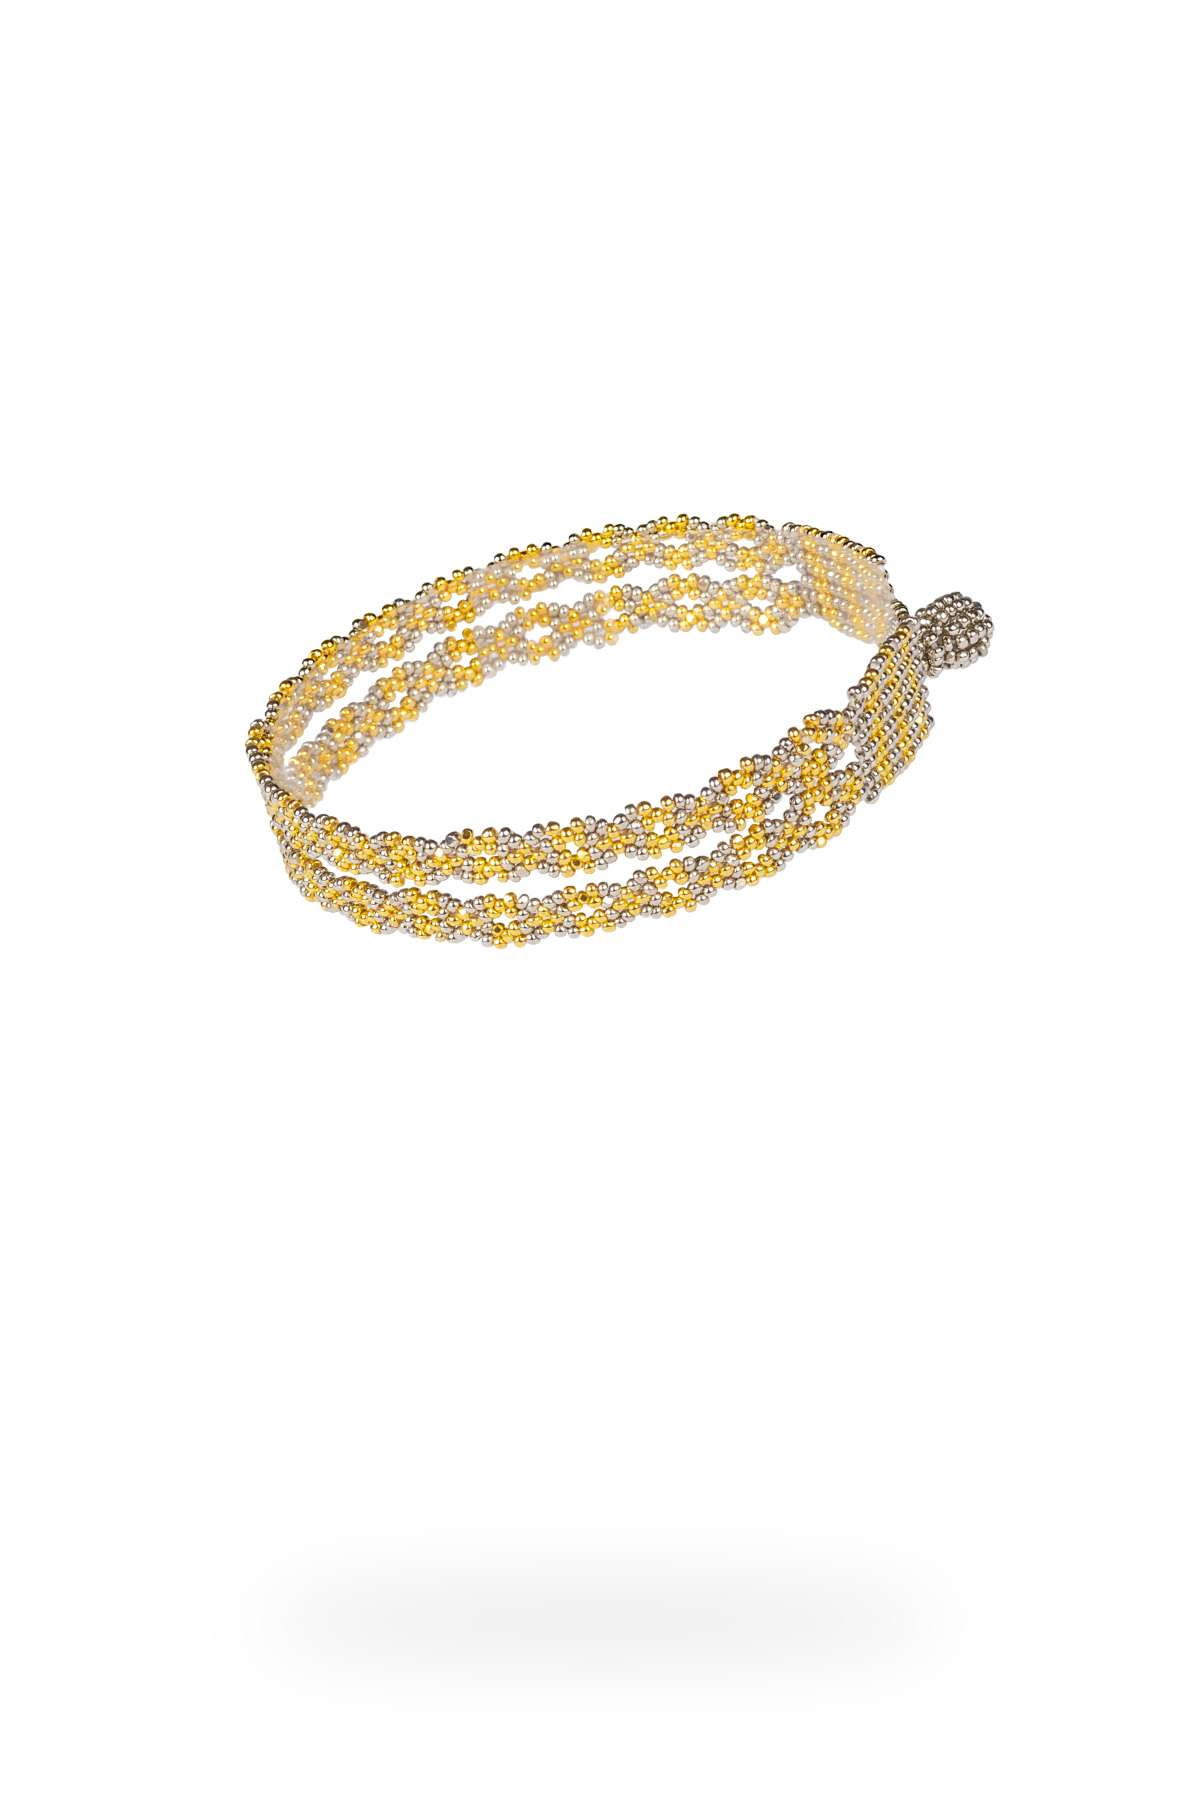 19 brazalete cadena doble oro